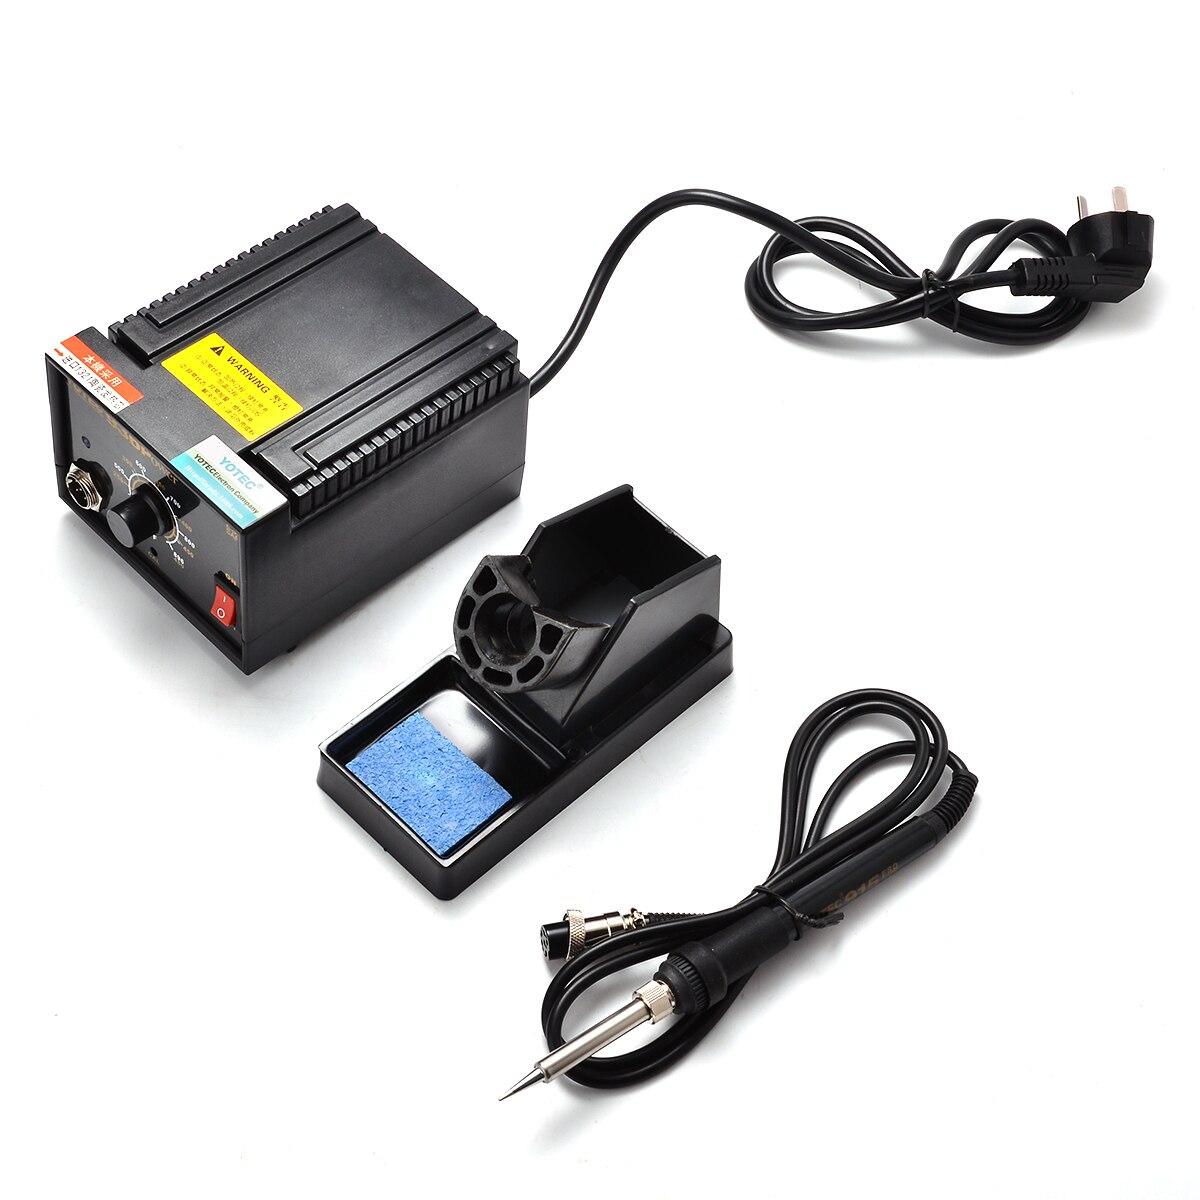 110V 220V 936 Power Soldering Station Soldering Iron Holder Handle Frequency Change Desoldering Welding Tool